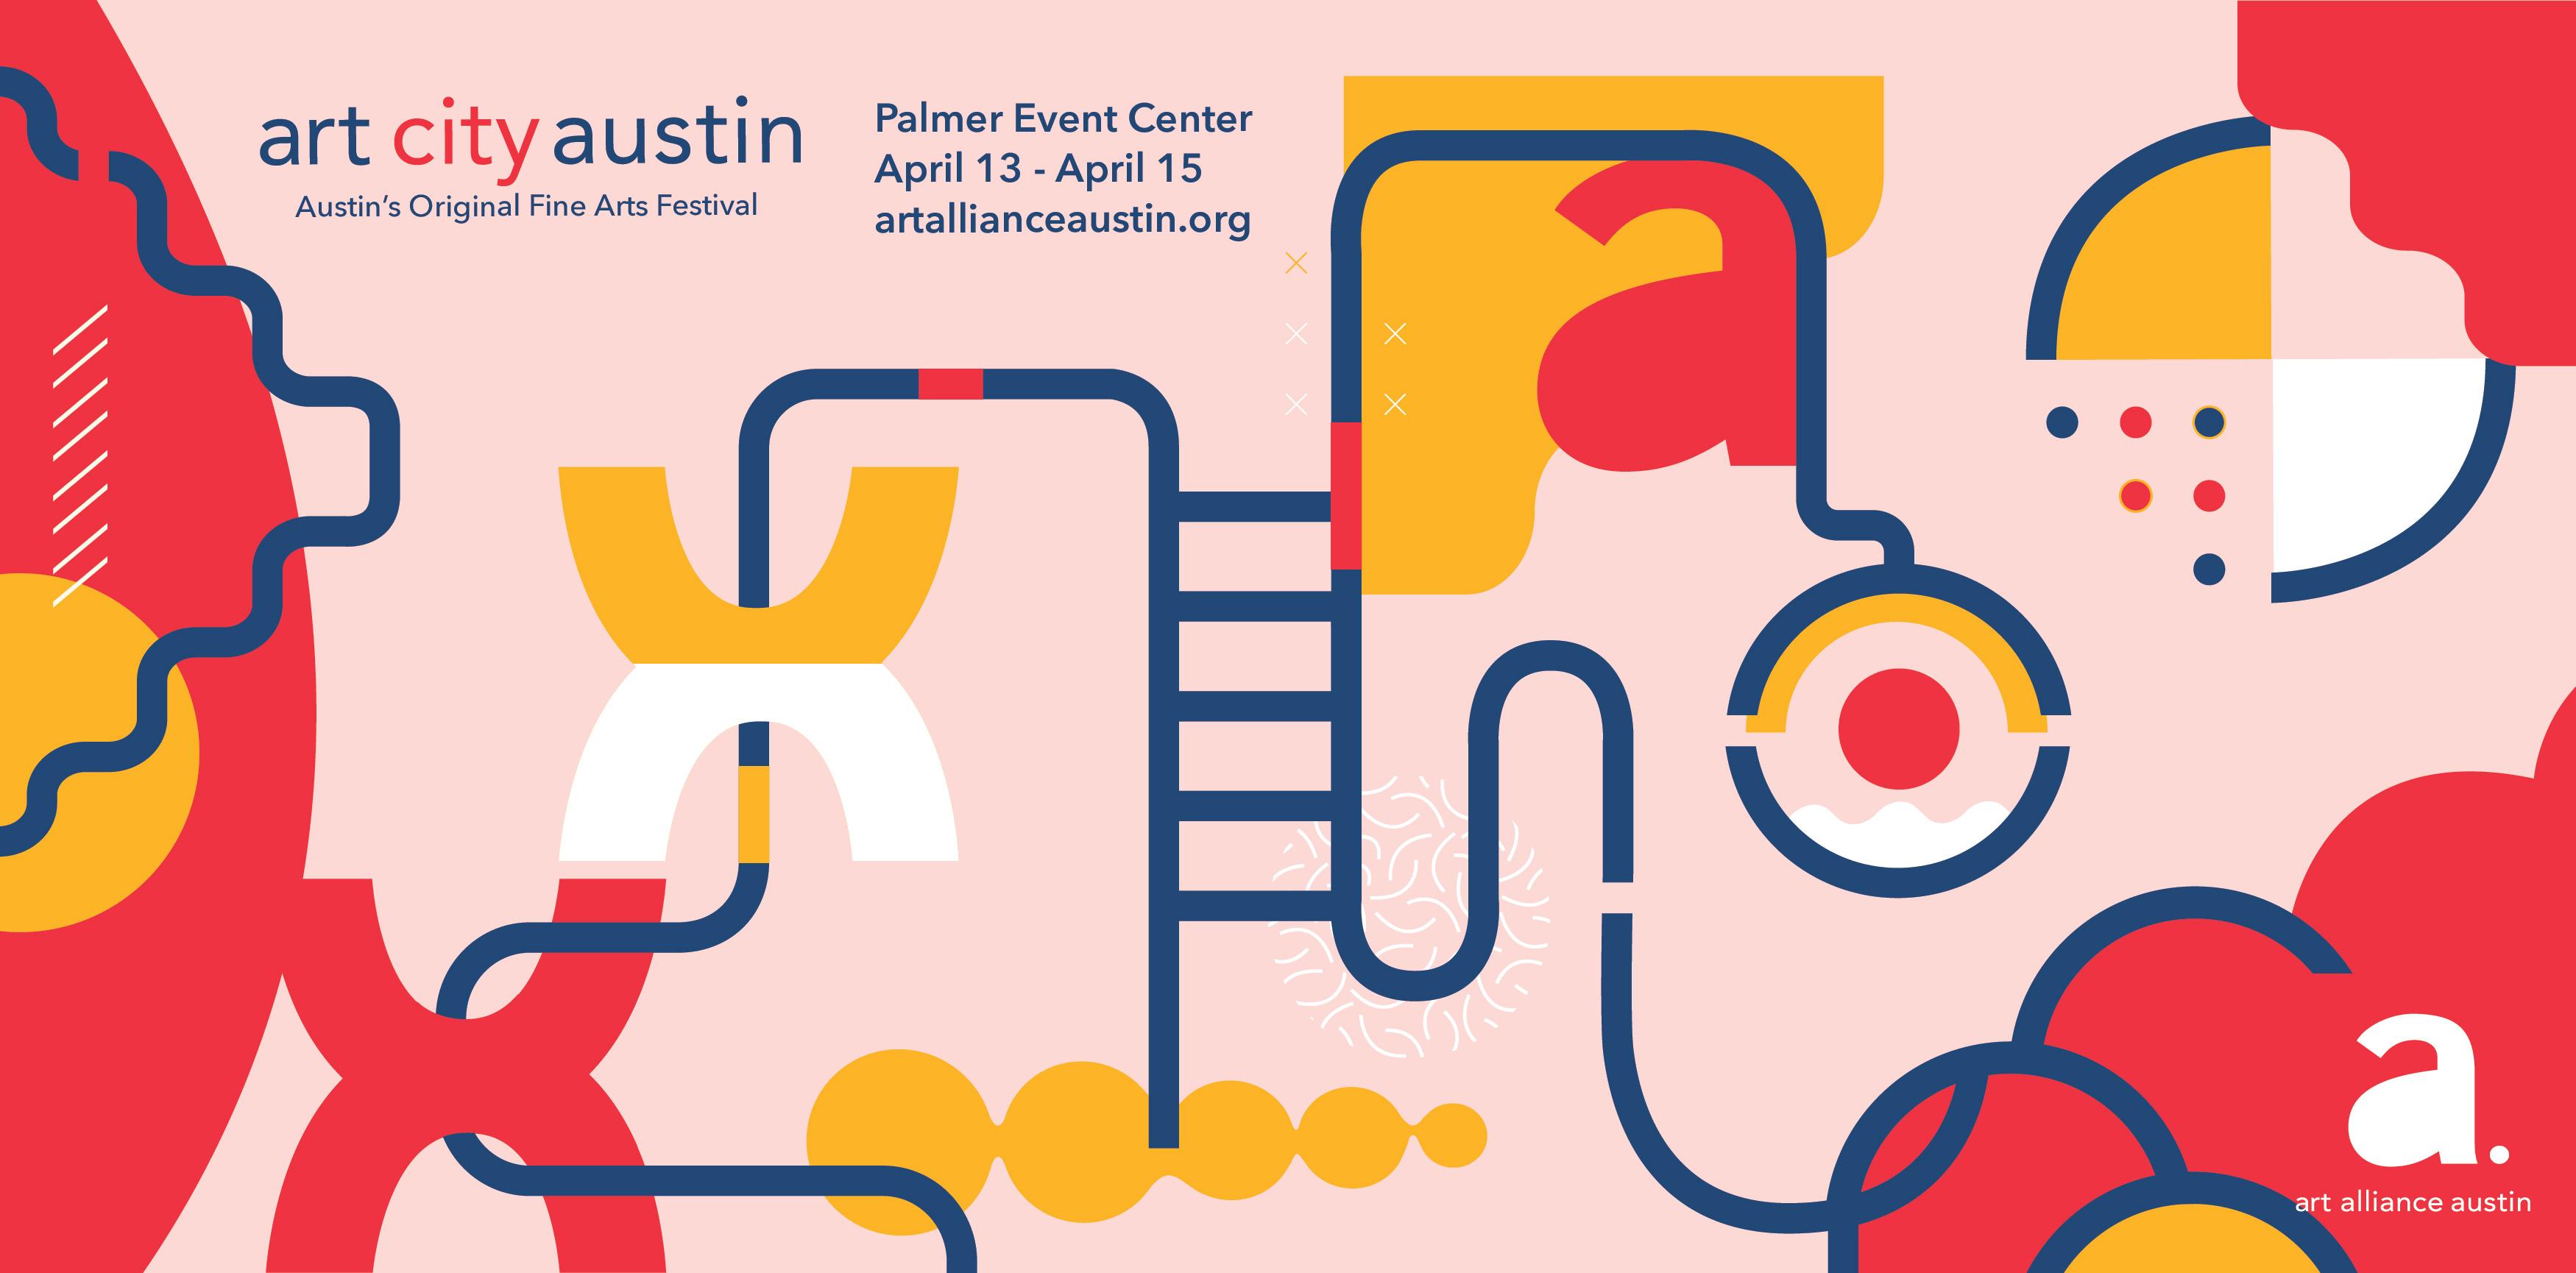 Art City Austin: Fine Arts Festival 2018